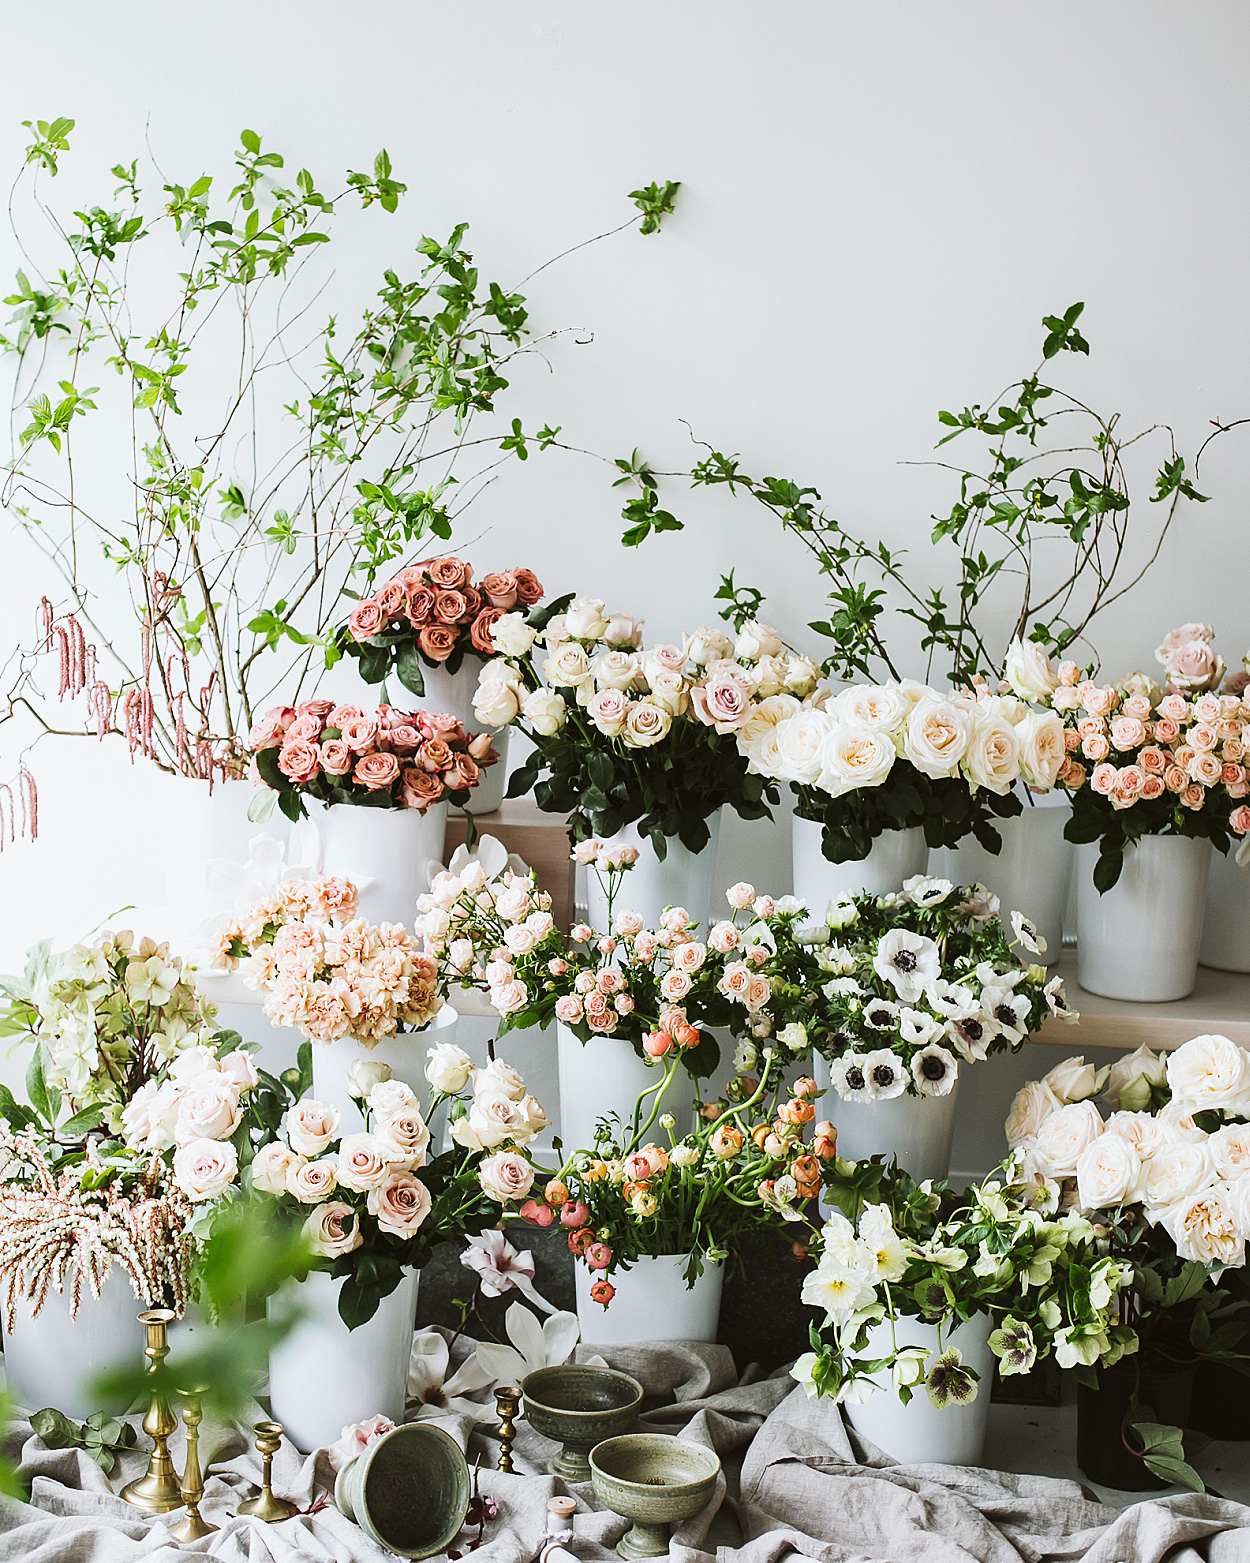 romantic-wedding-flowers-pots-0516.jpg